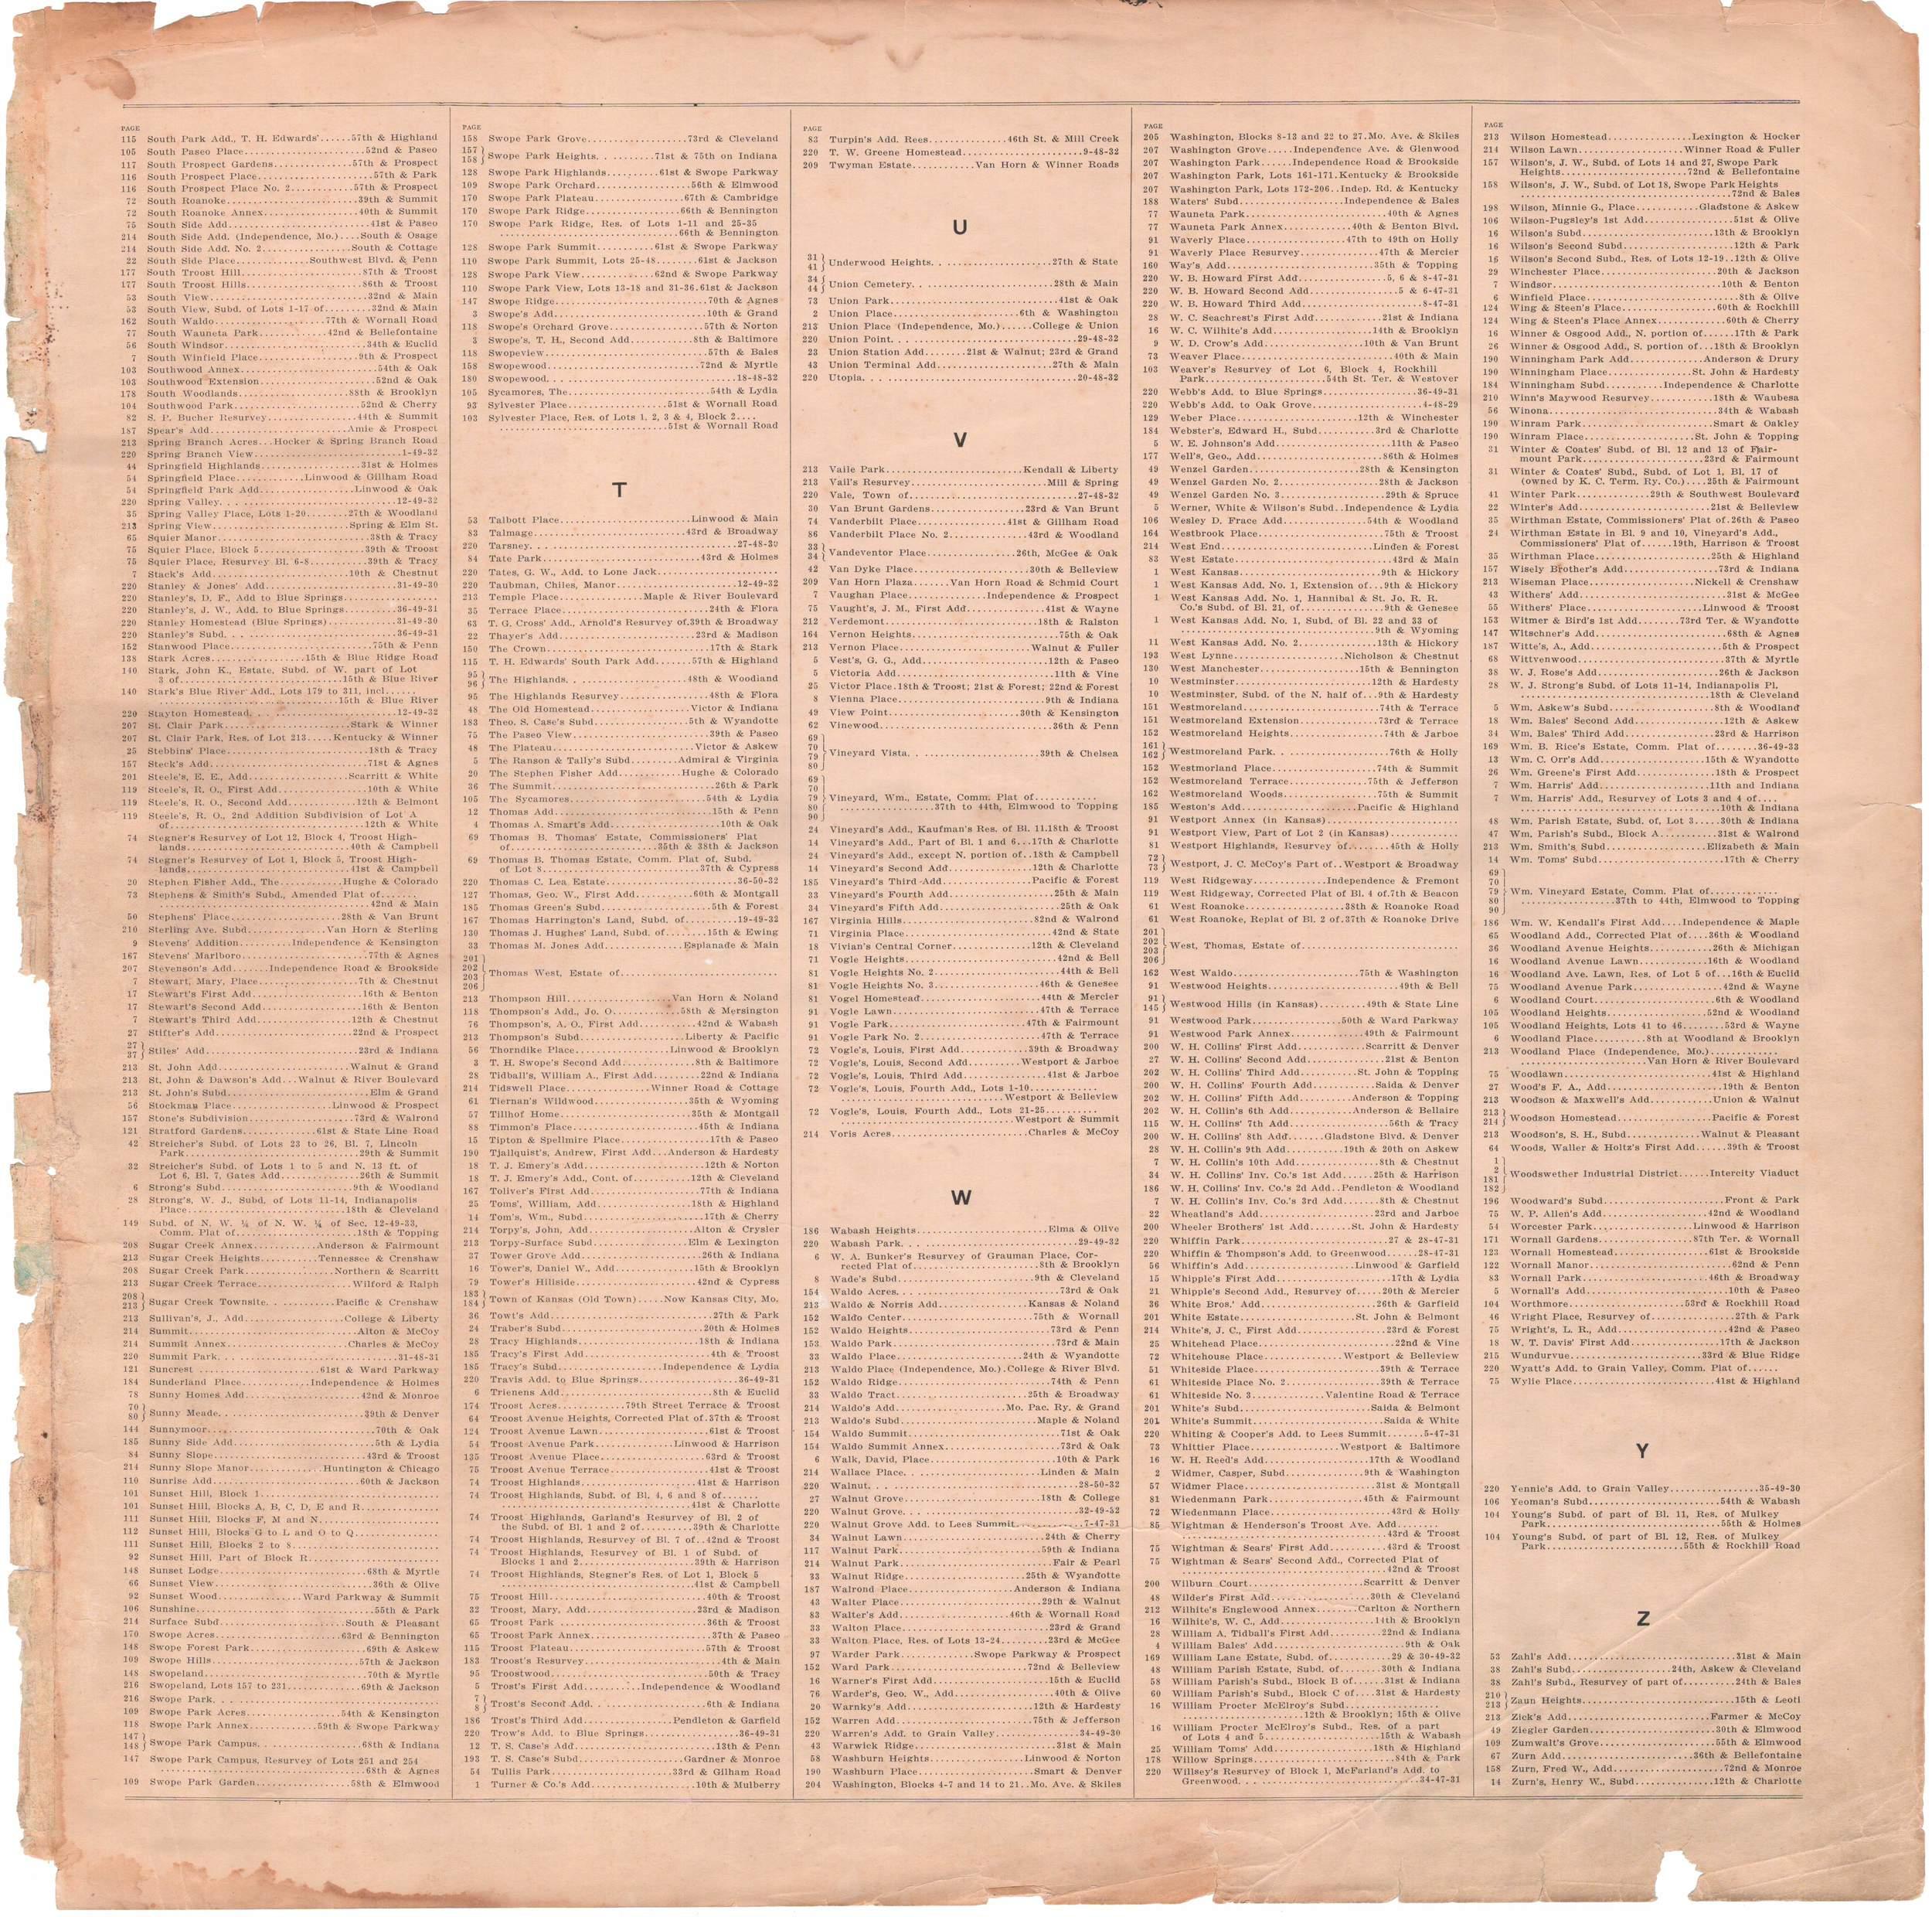 1925 TUTTLE_AYERS_Index_T-Z.JPG